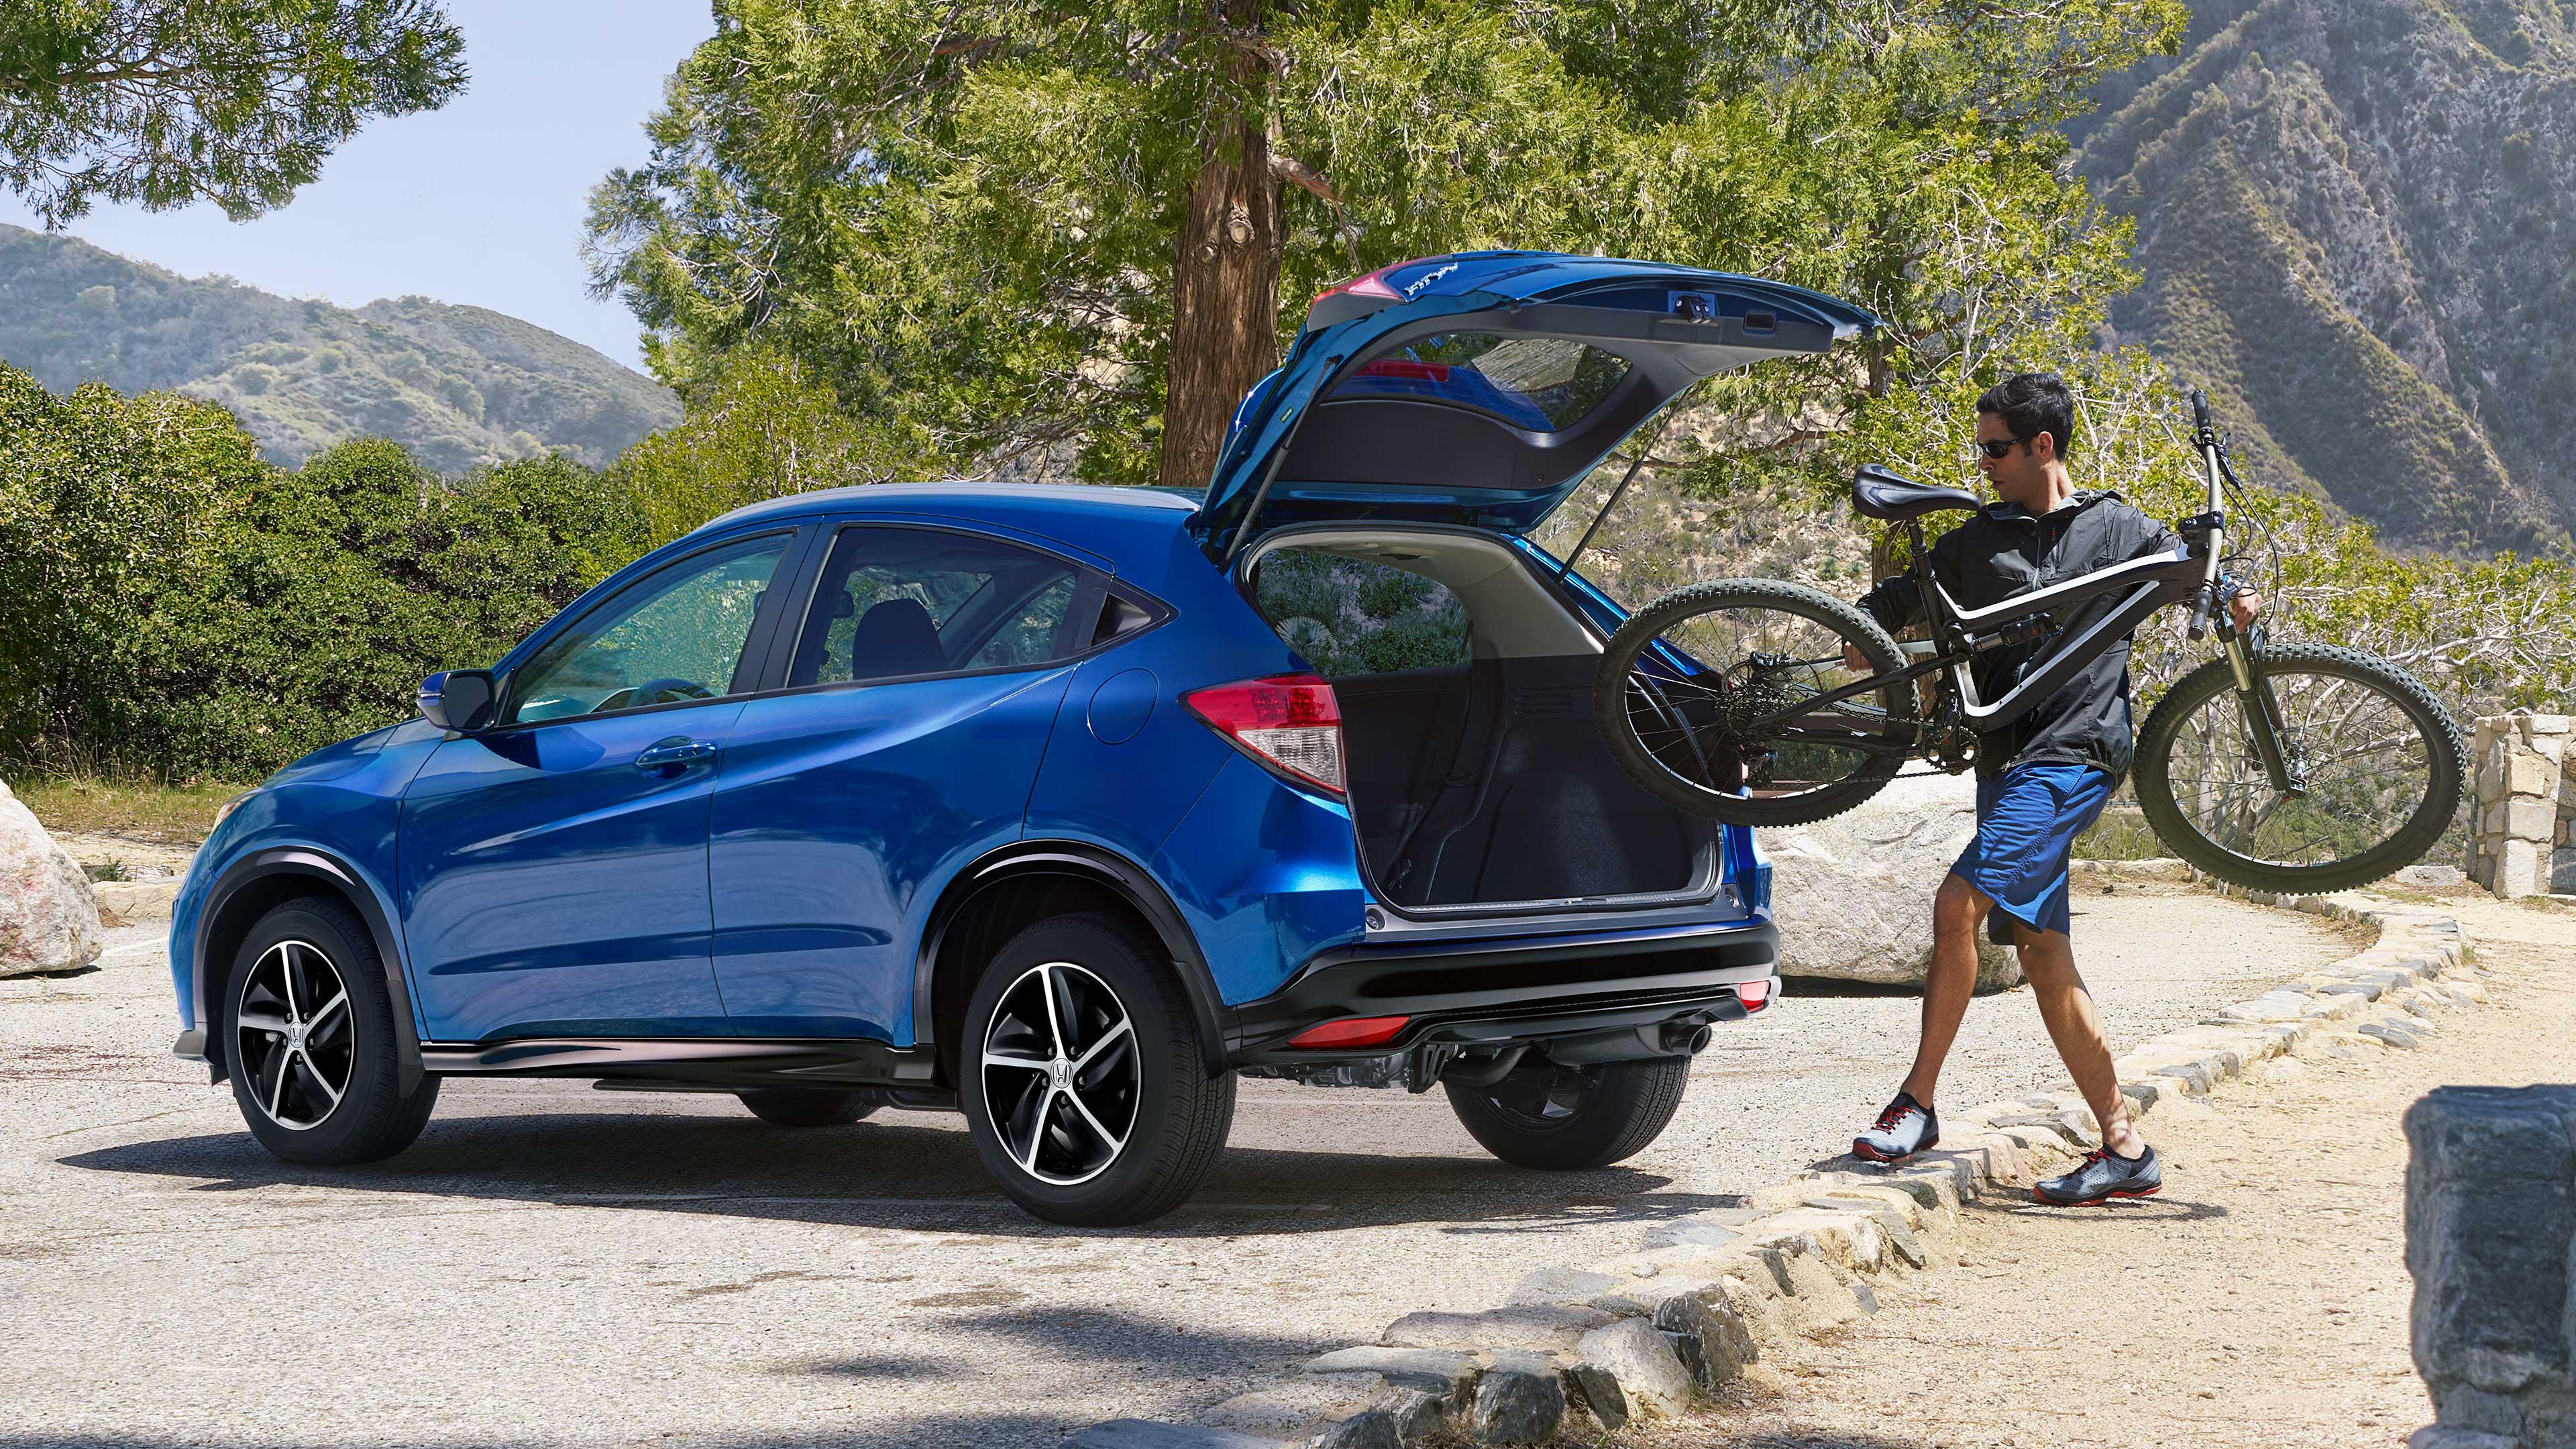 Man loading a bike into the back of a 2020 Honda HR-V